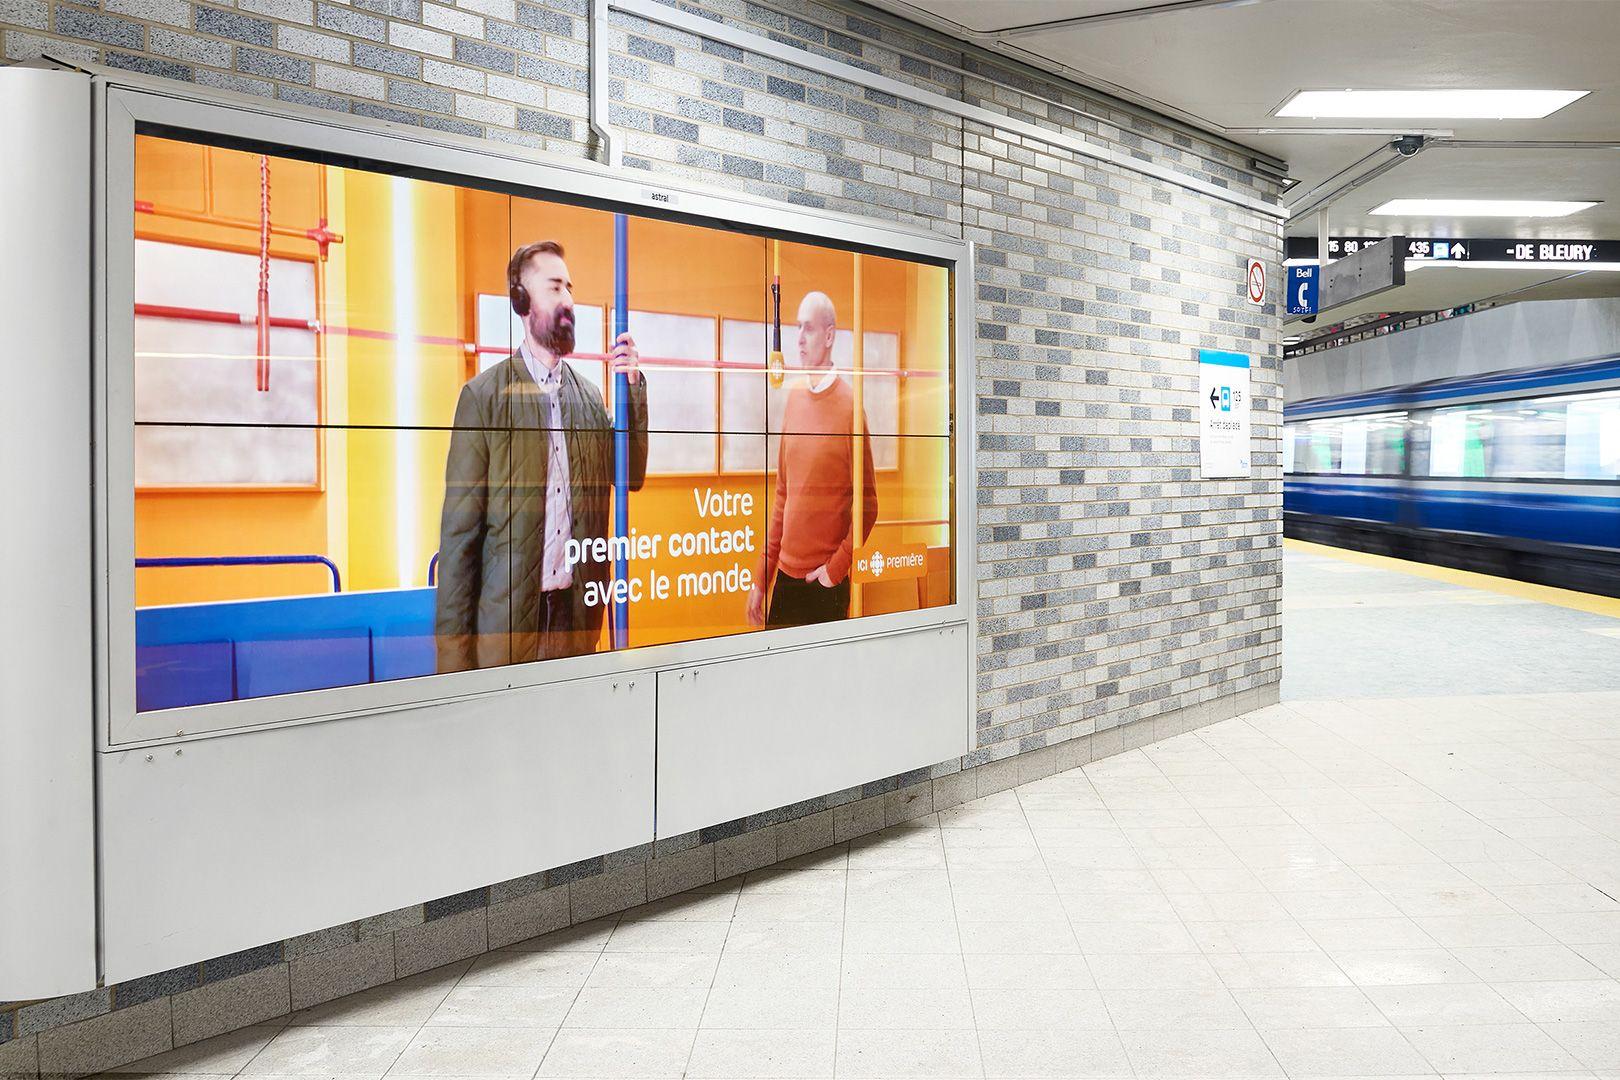 Metro ad campaign for ICI Première by Simon Duhamel at the Place-des-Arts station